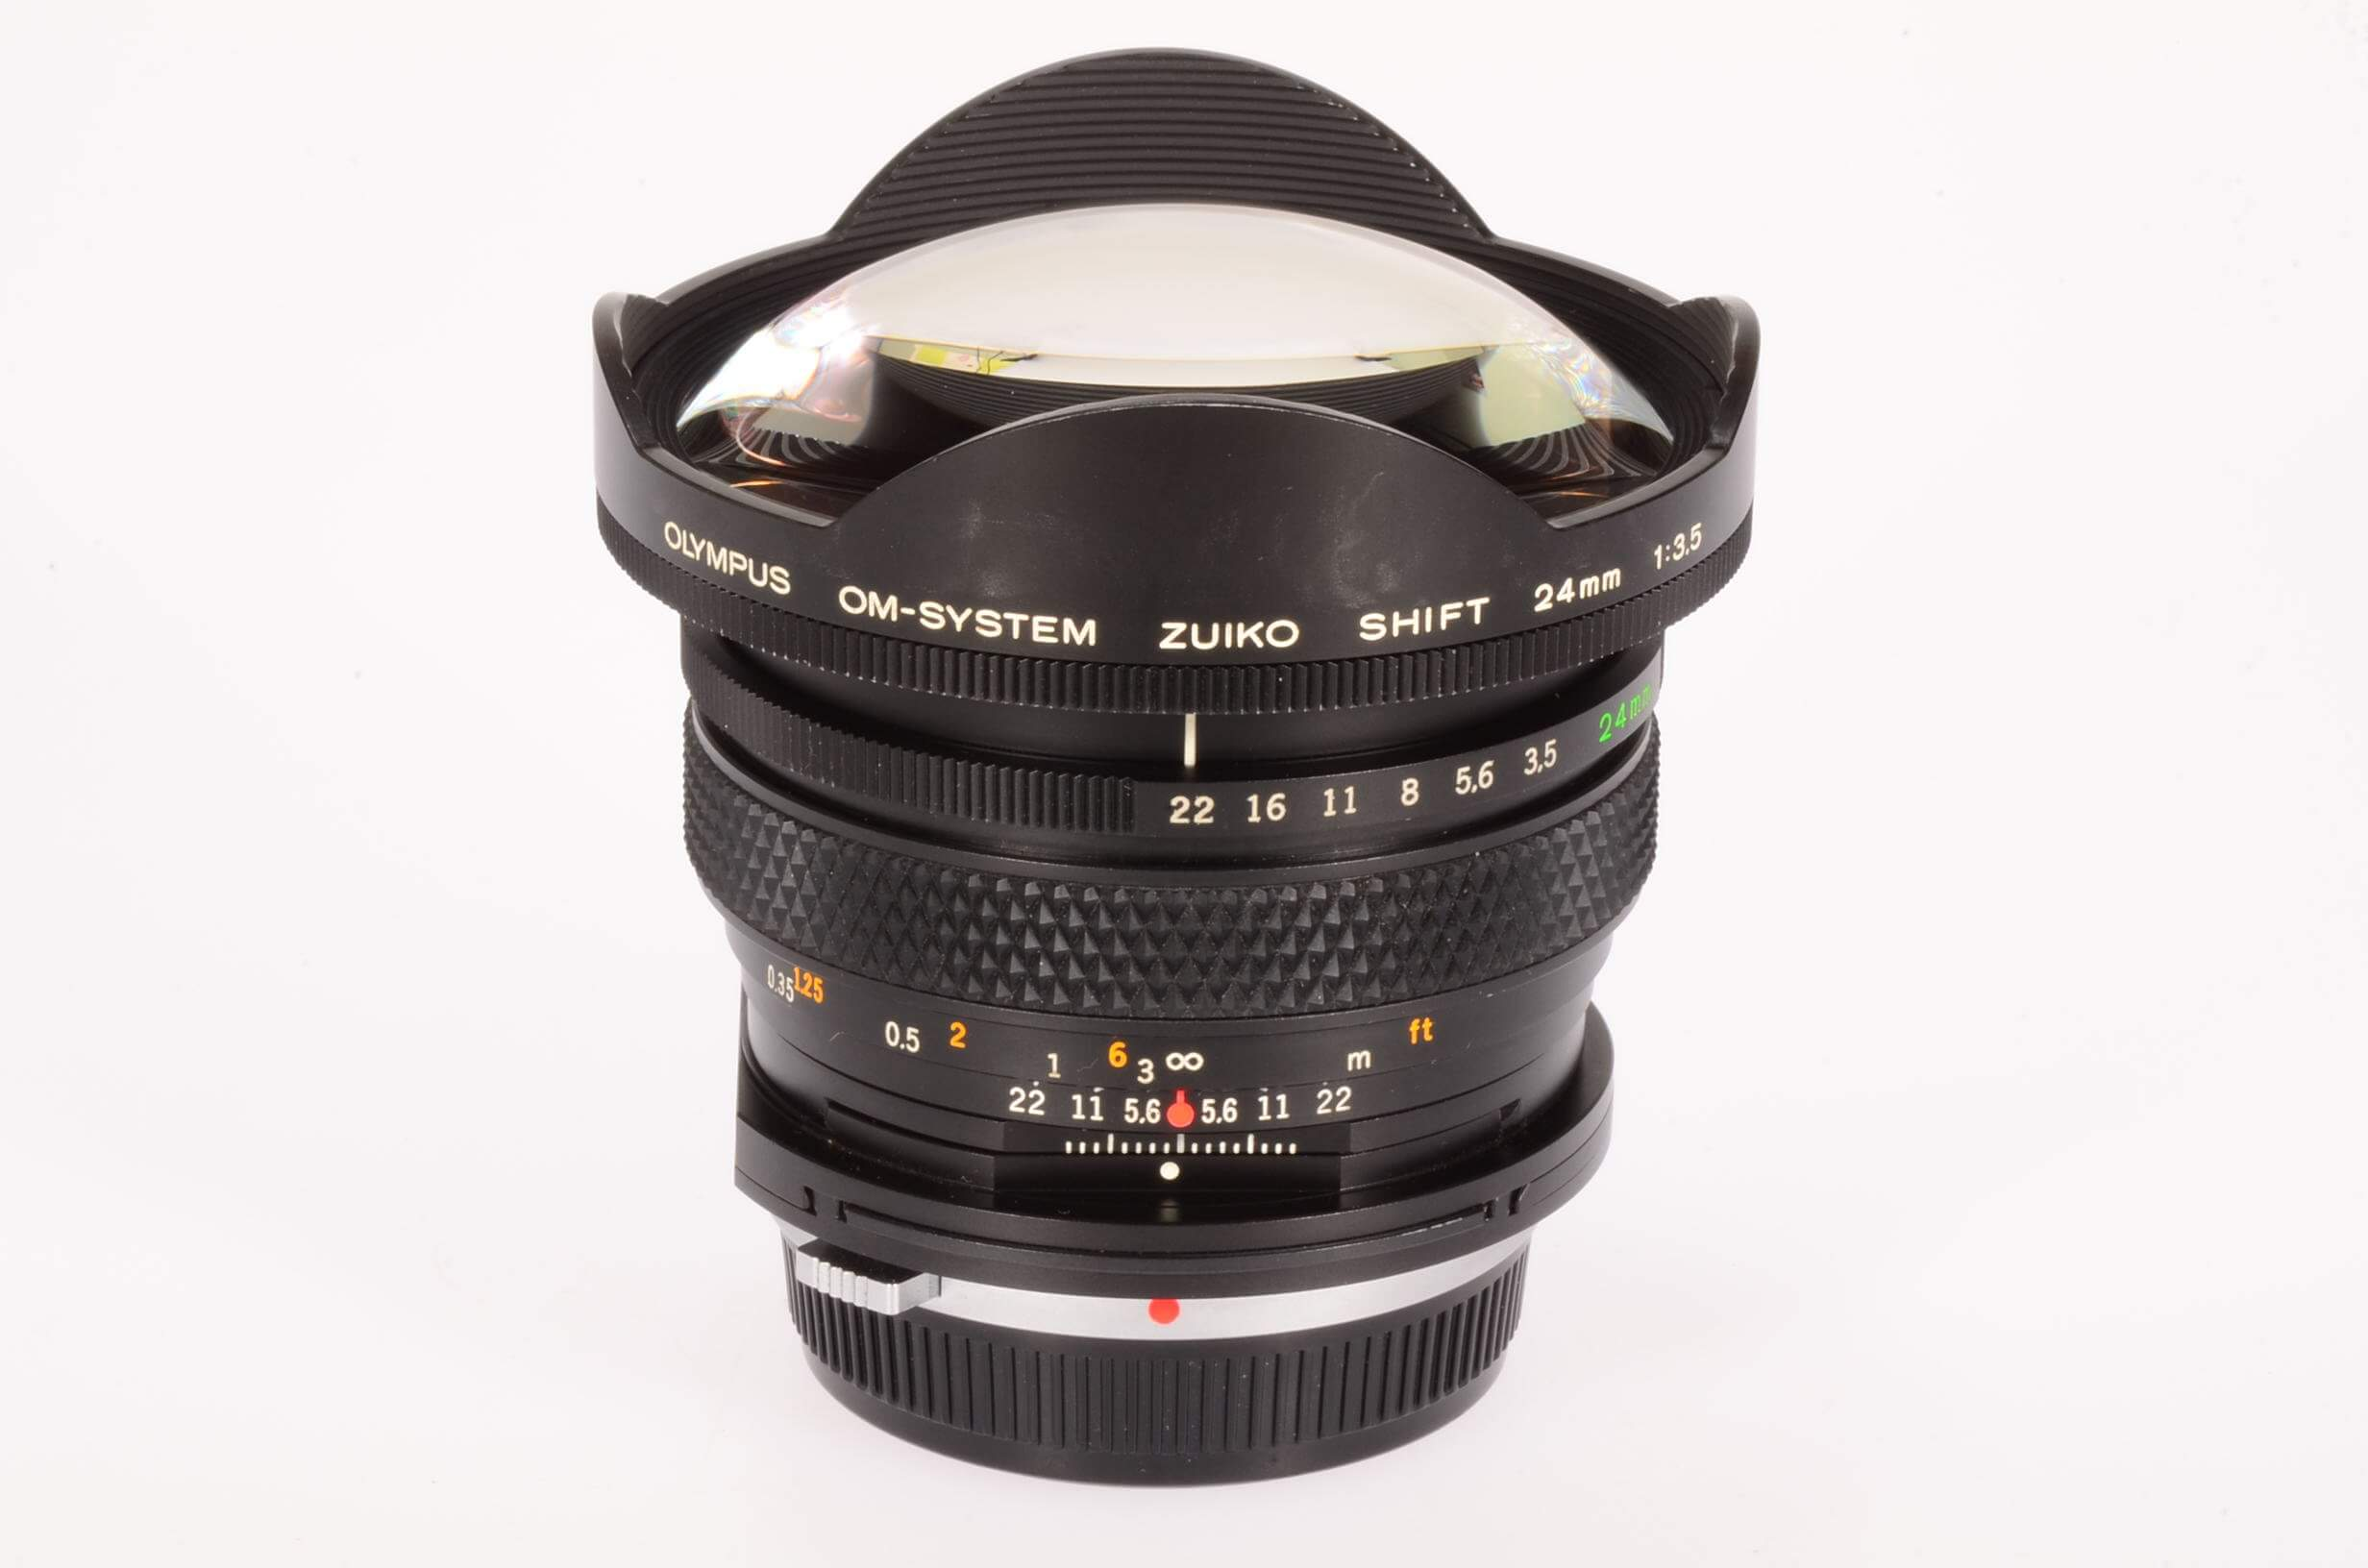 Olympus 24mm f3.5 Zuiko Shift lens, rare!